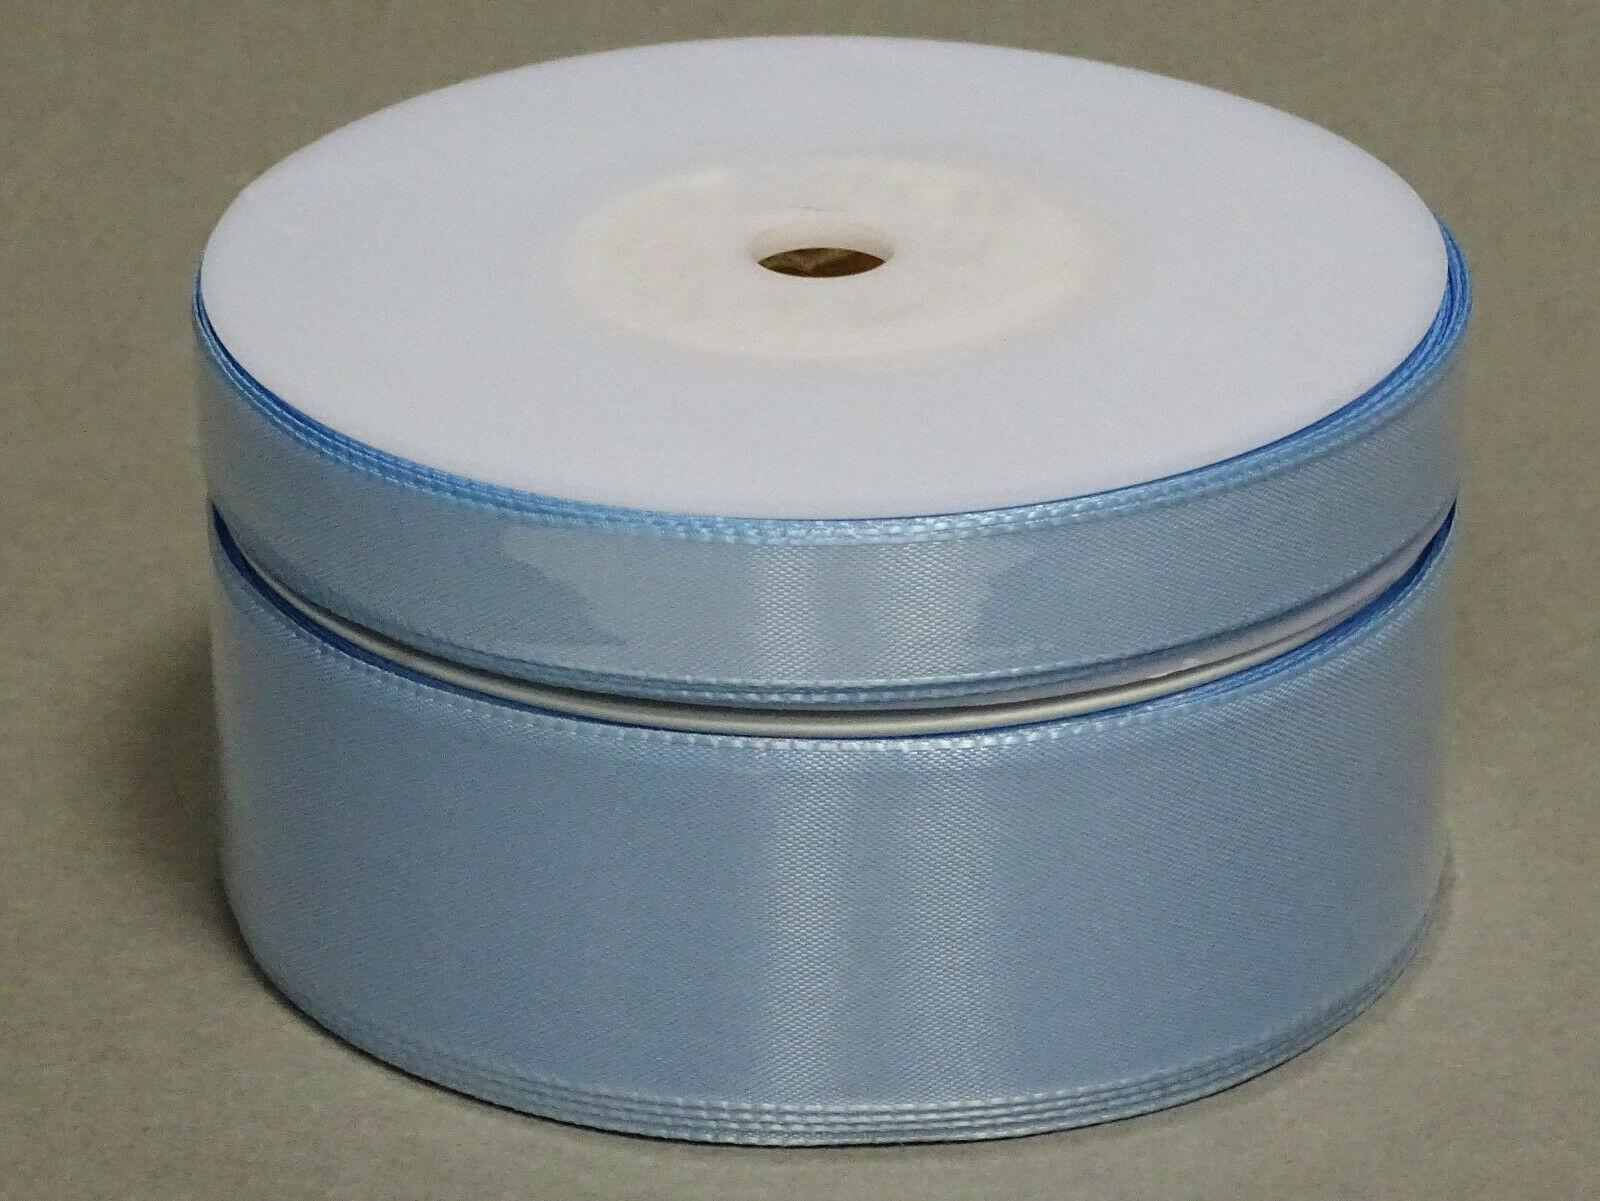 Seidenband Schleifenband 50 m x 15 / 25 / 40mm Dekoband ab 0,08€/m Geschenkband  - Hellblau 754, 15 mm x 50 m